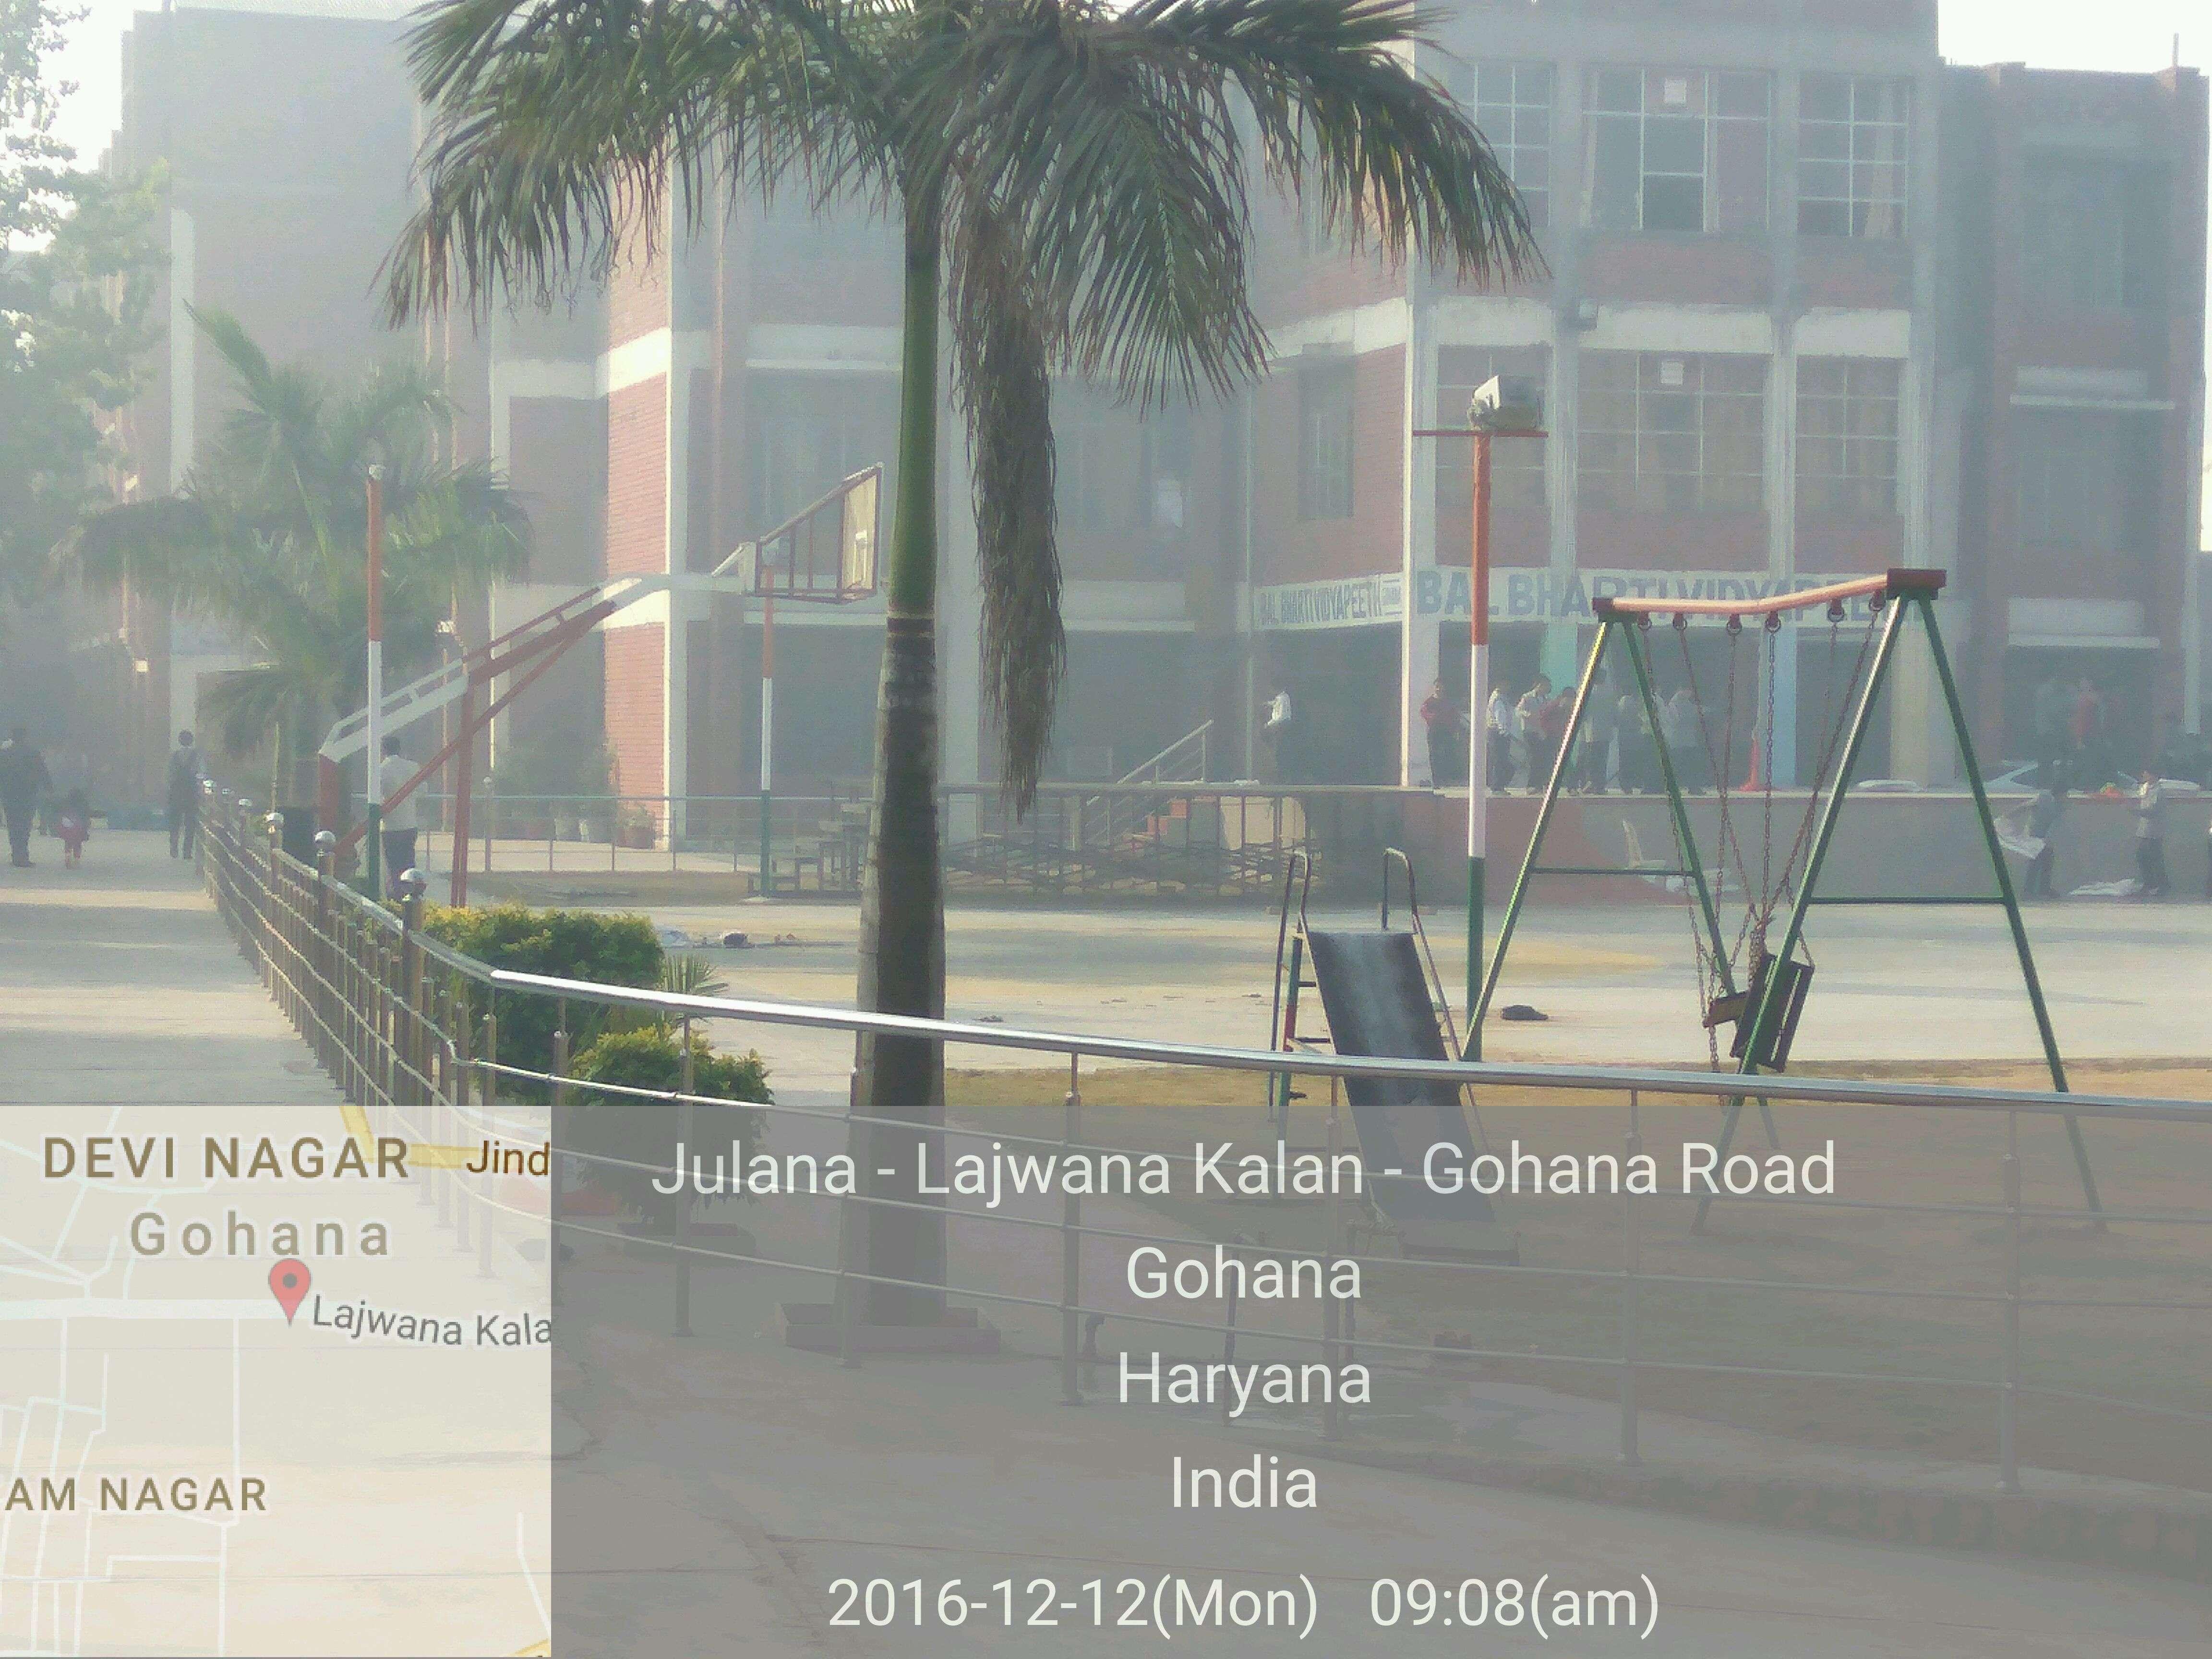 BAL BHARTI VIDYA PEETH OPP CIVIL HOSPITAL BARODA ROAD GOHANA HARYANA 530576